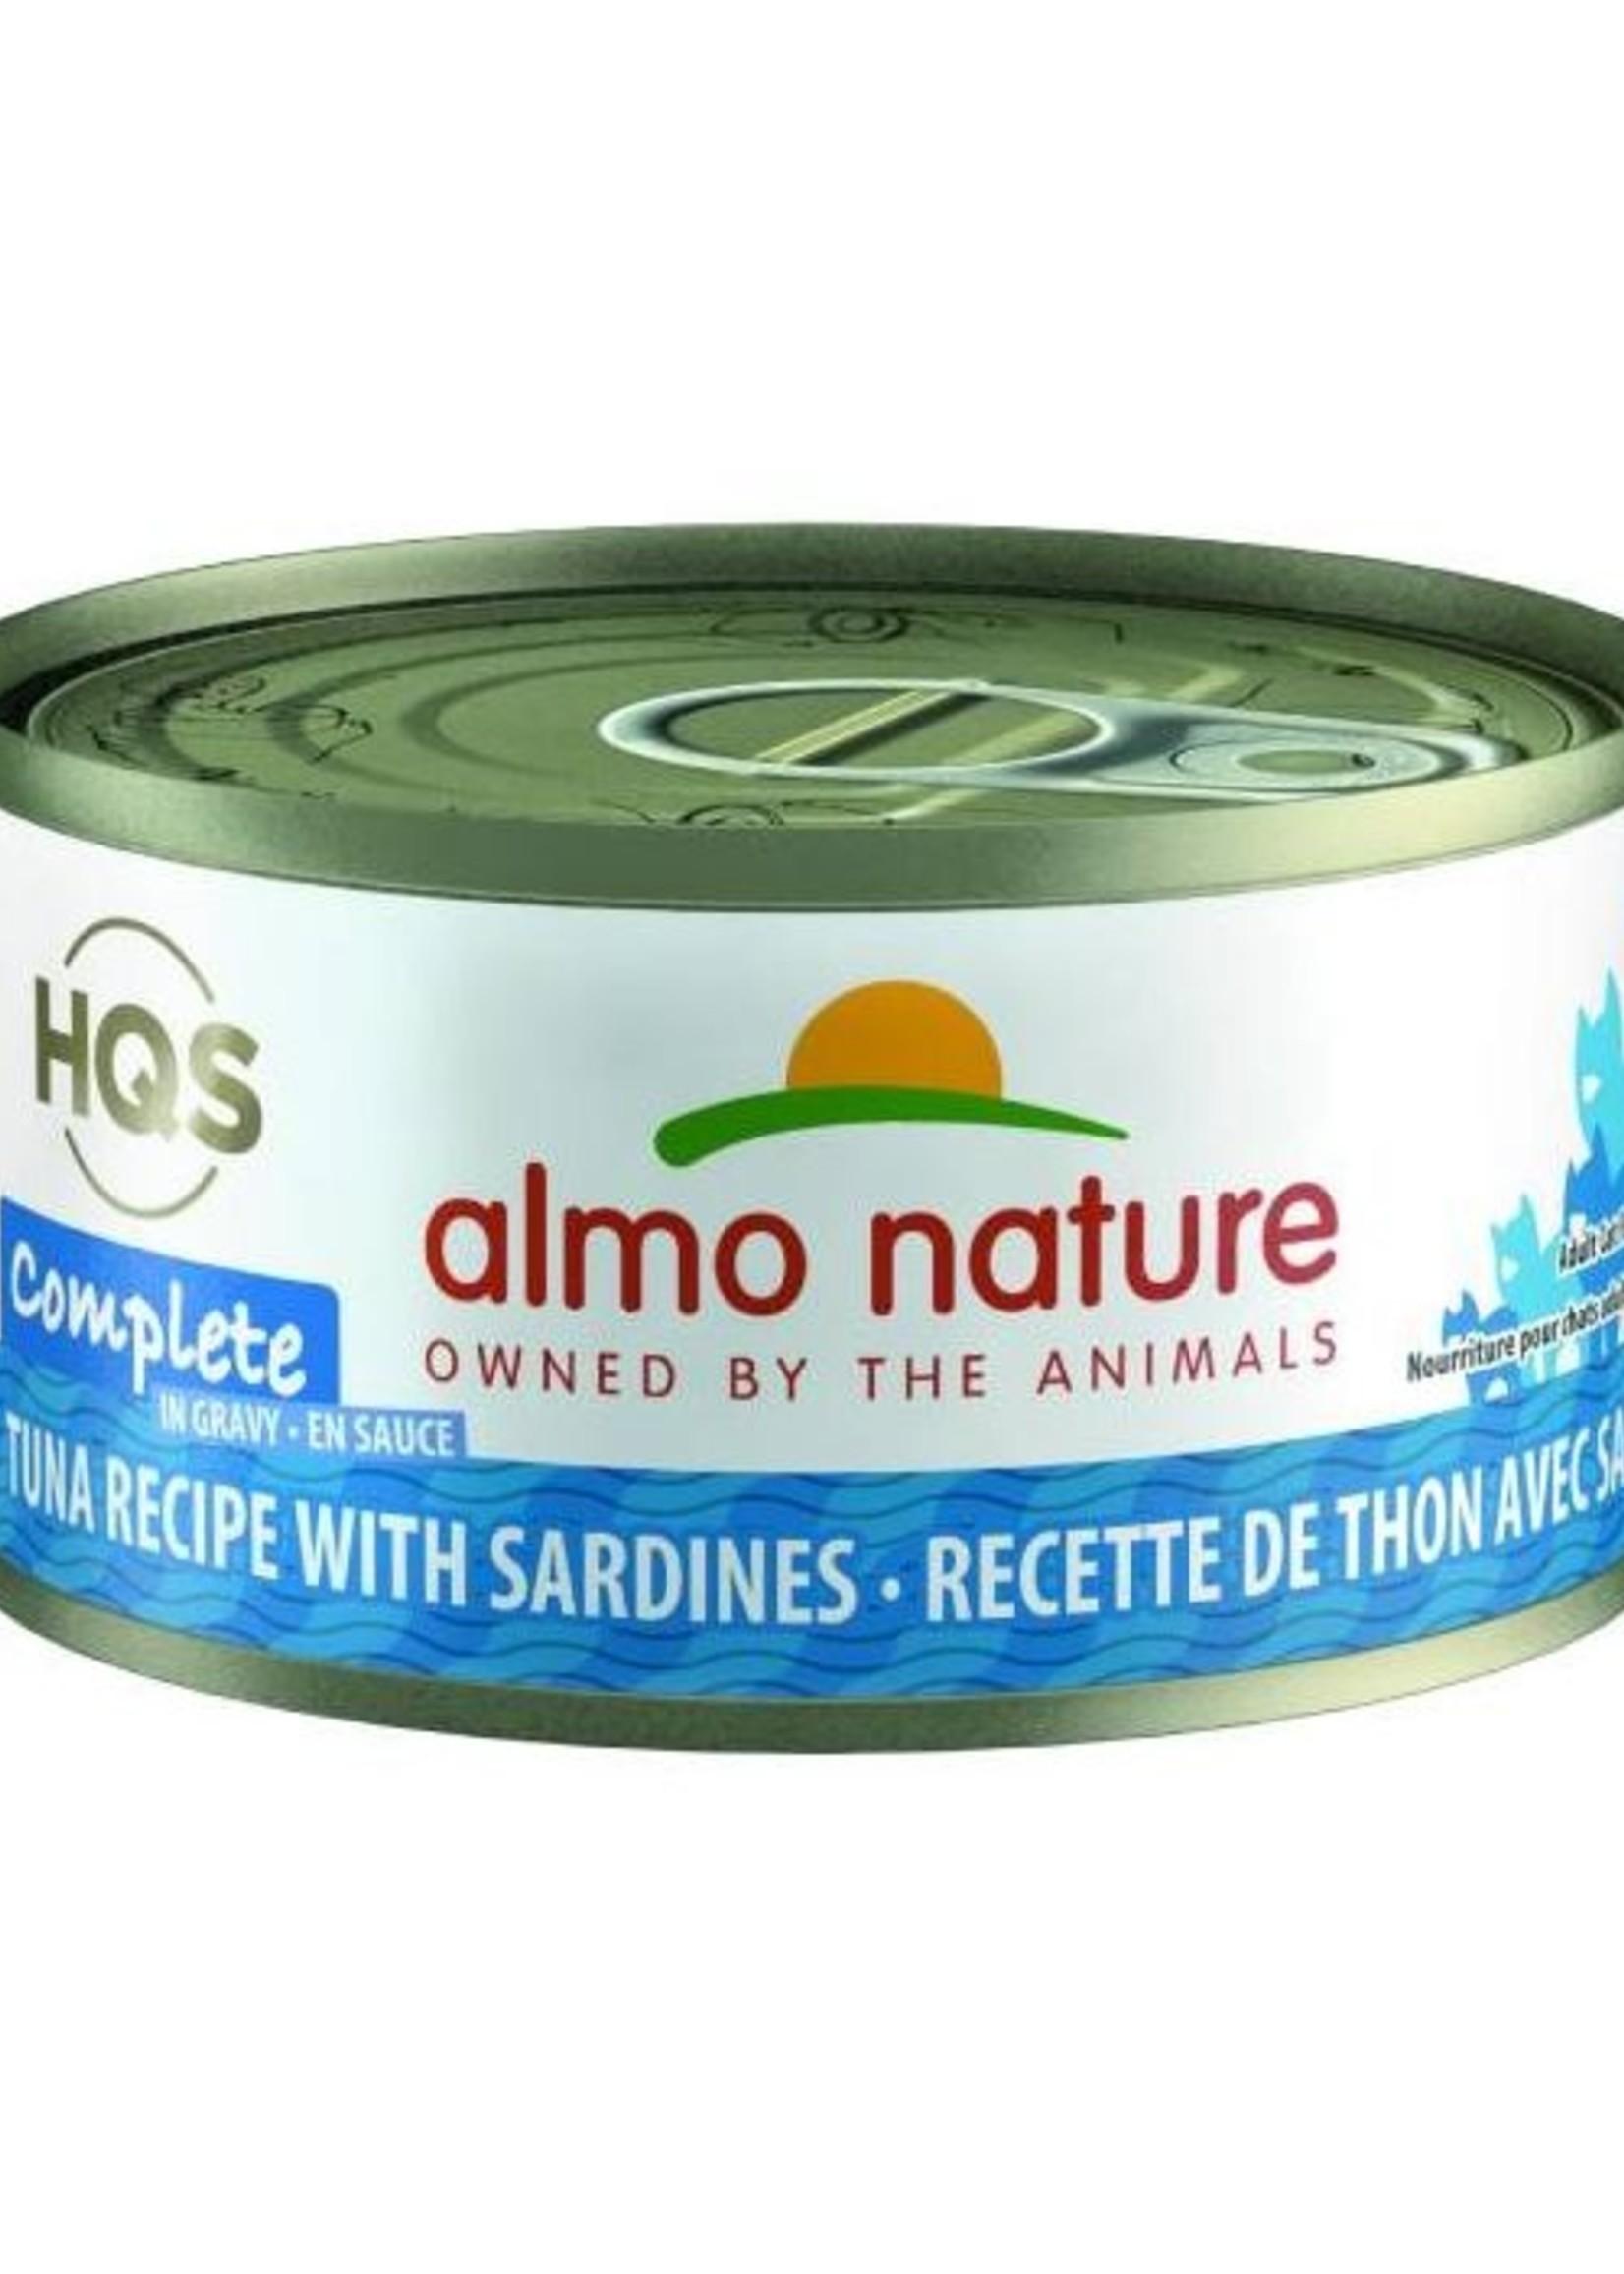 Almo Nature© Almo Nature HQS Complete Tuna Recipe with Sardines in Gravy 70g